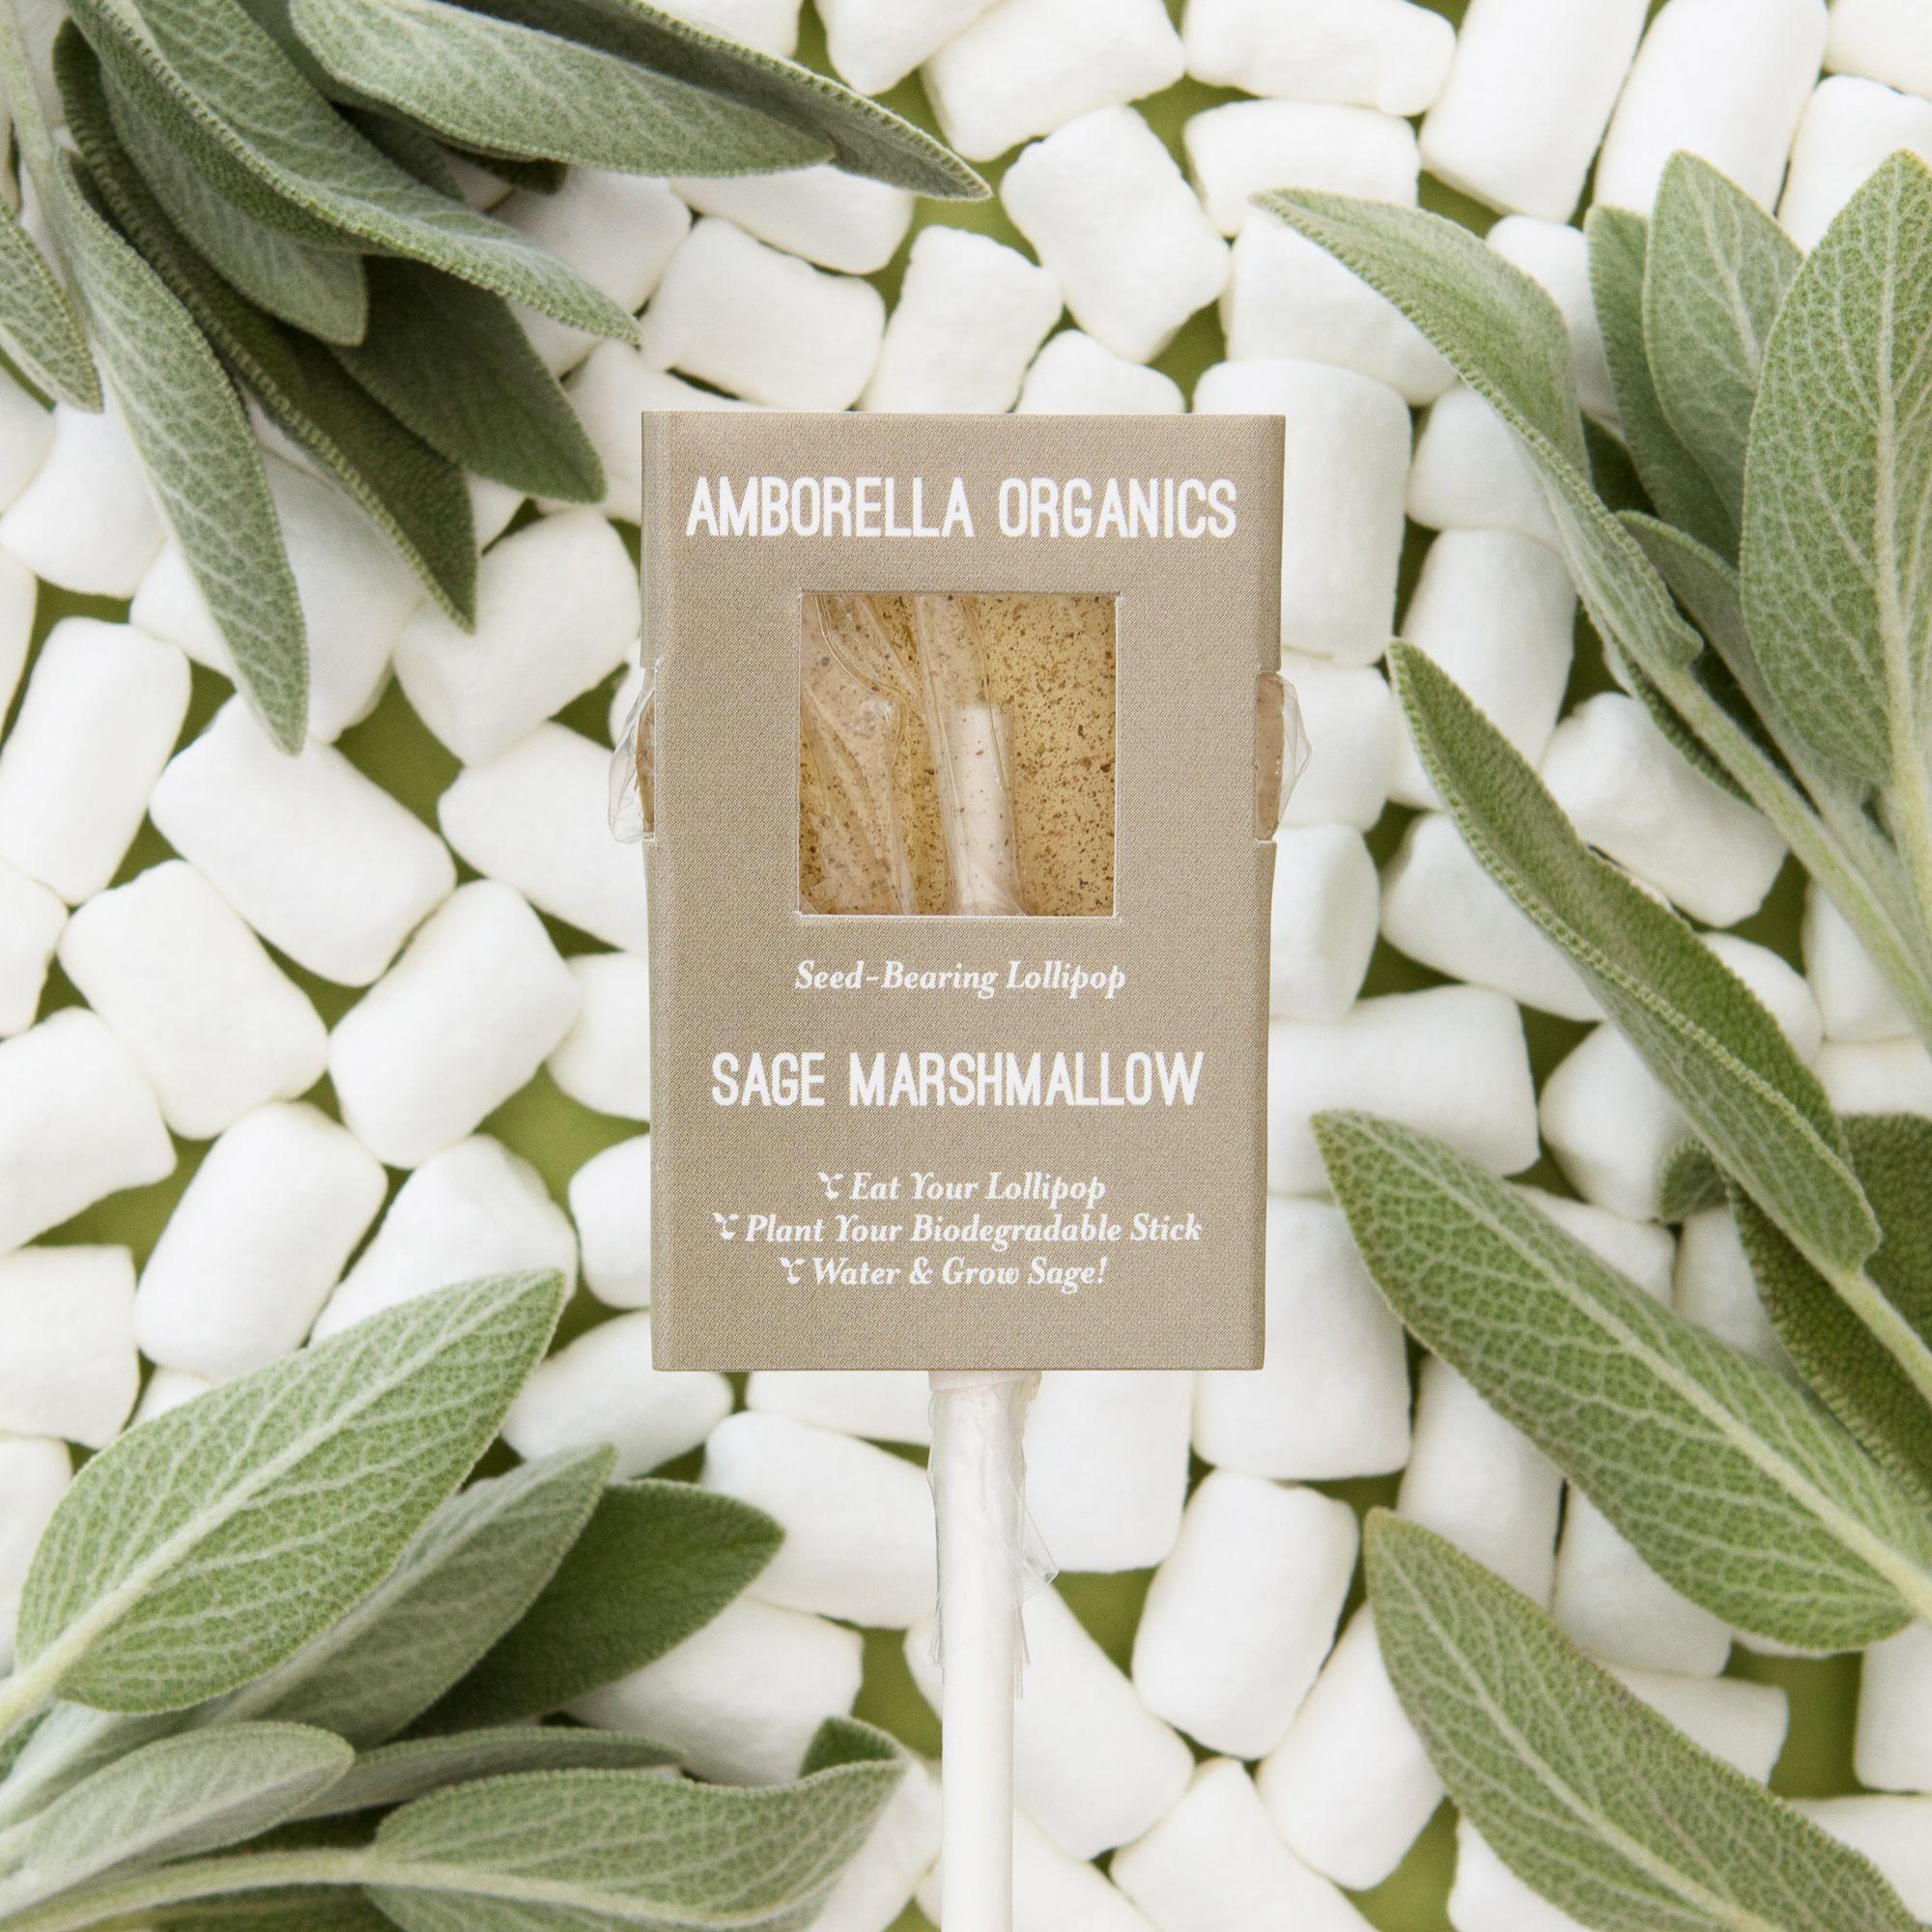 Sage Marshmallow 01.jpg